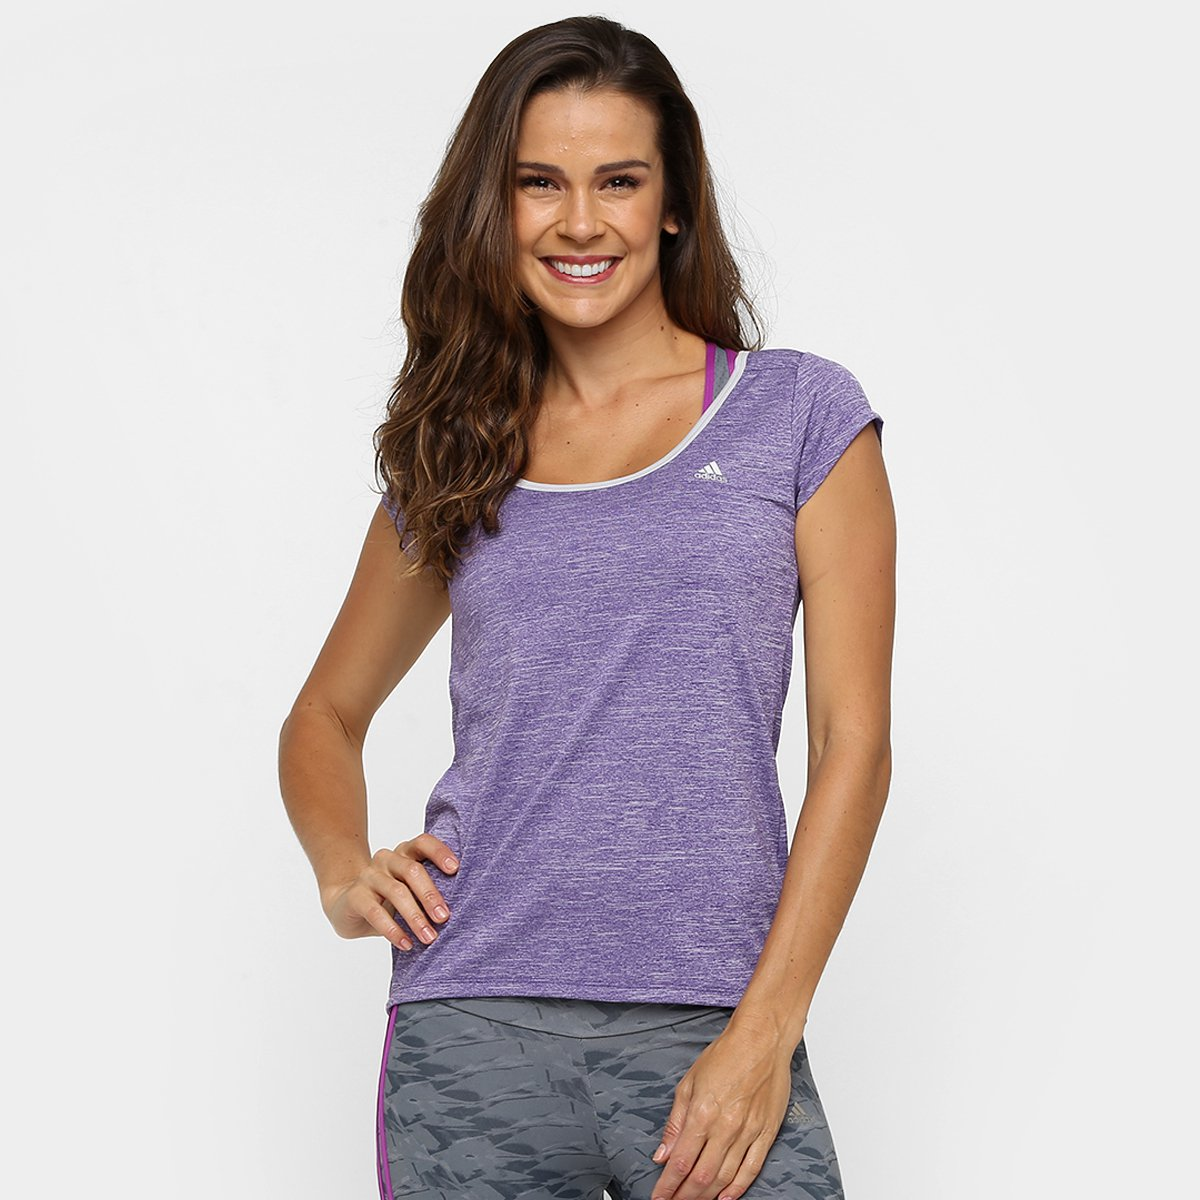 Clima Camiseta Mescla Adidas Ess Roxo Feminina Camiseta Adidas xpzIBB